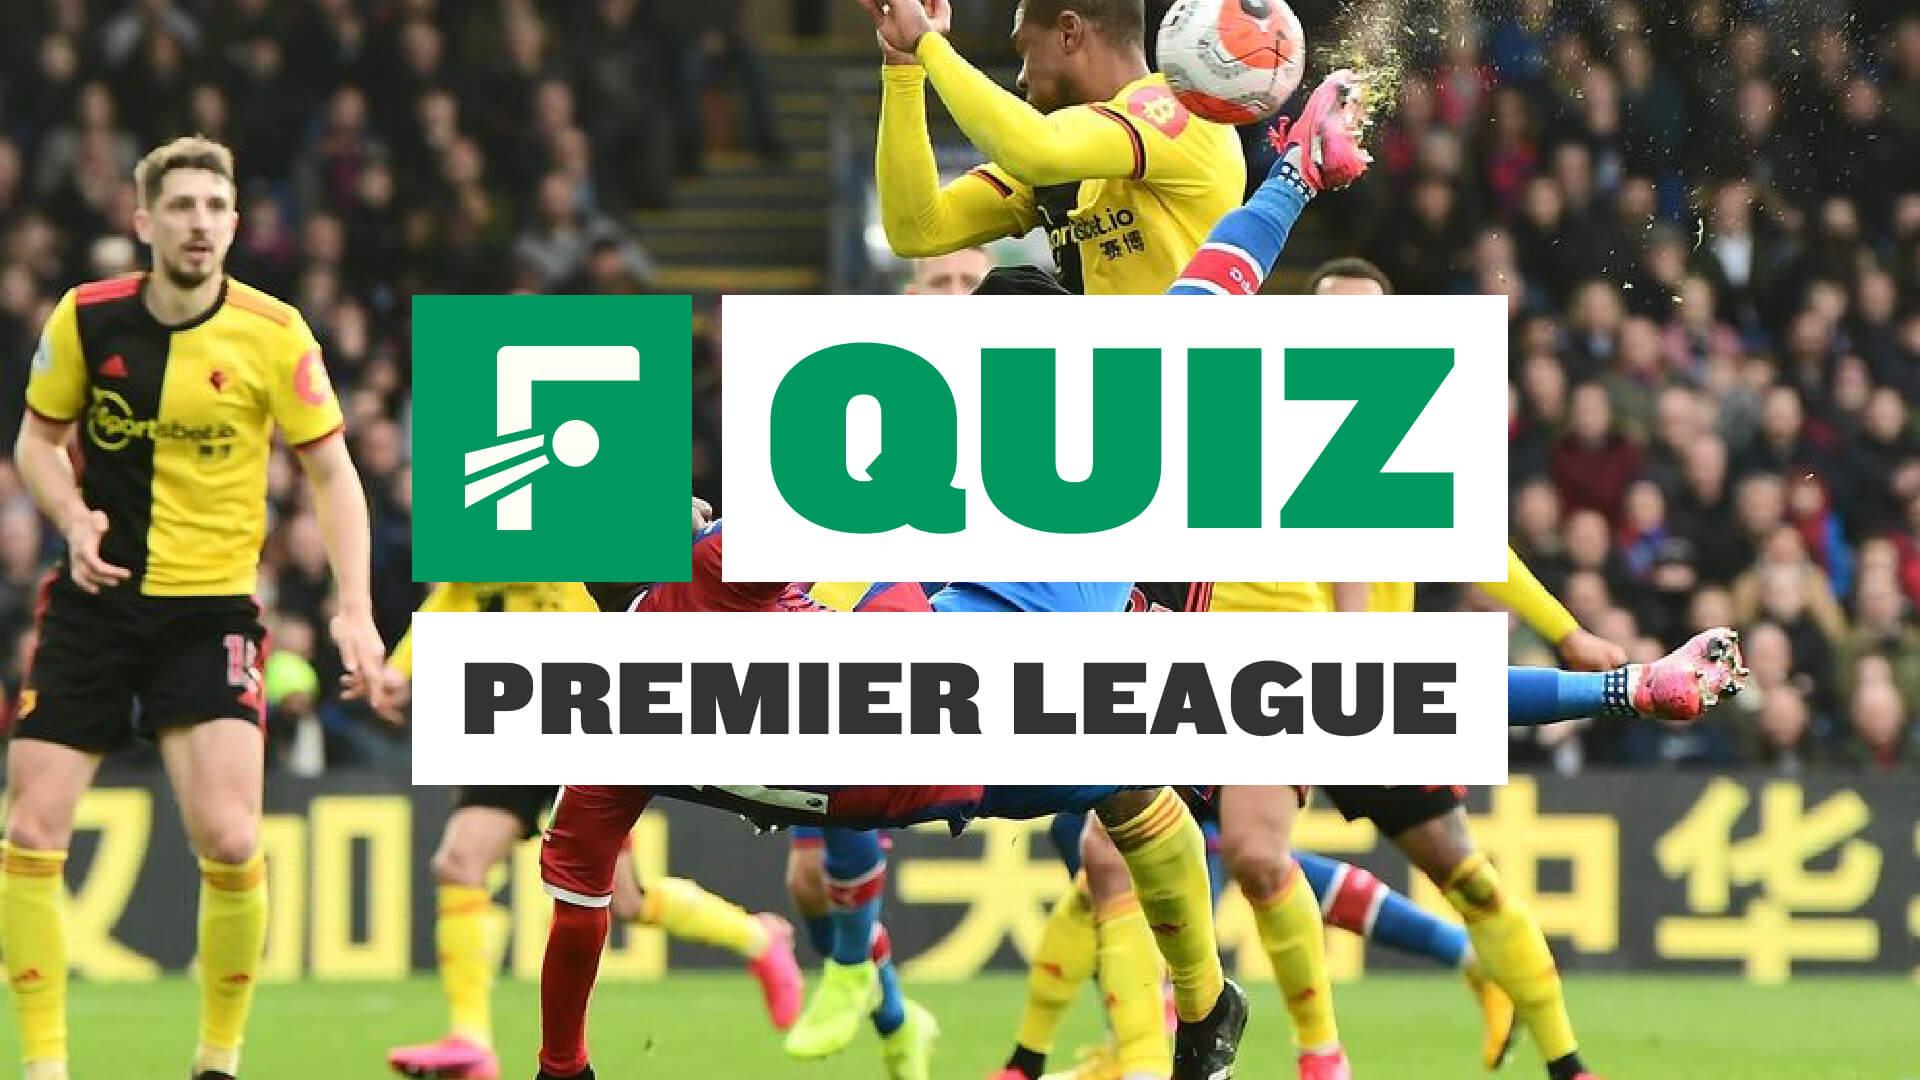 ✅ Quiz: Premier League Grab Bag (hard)